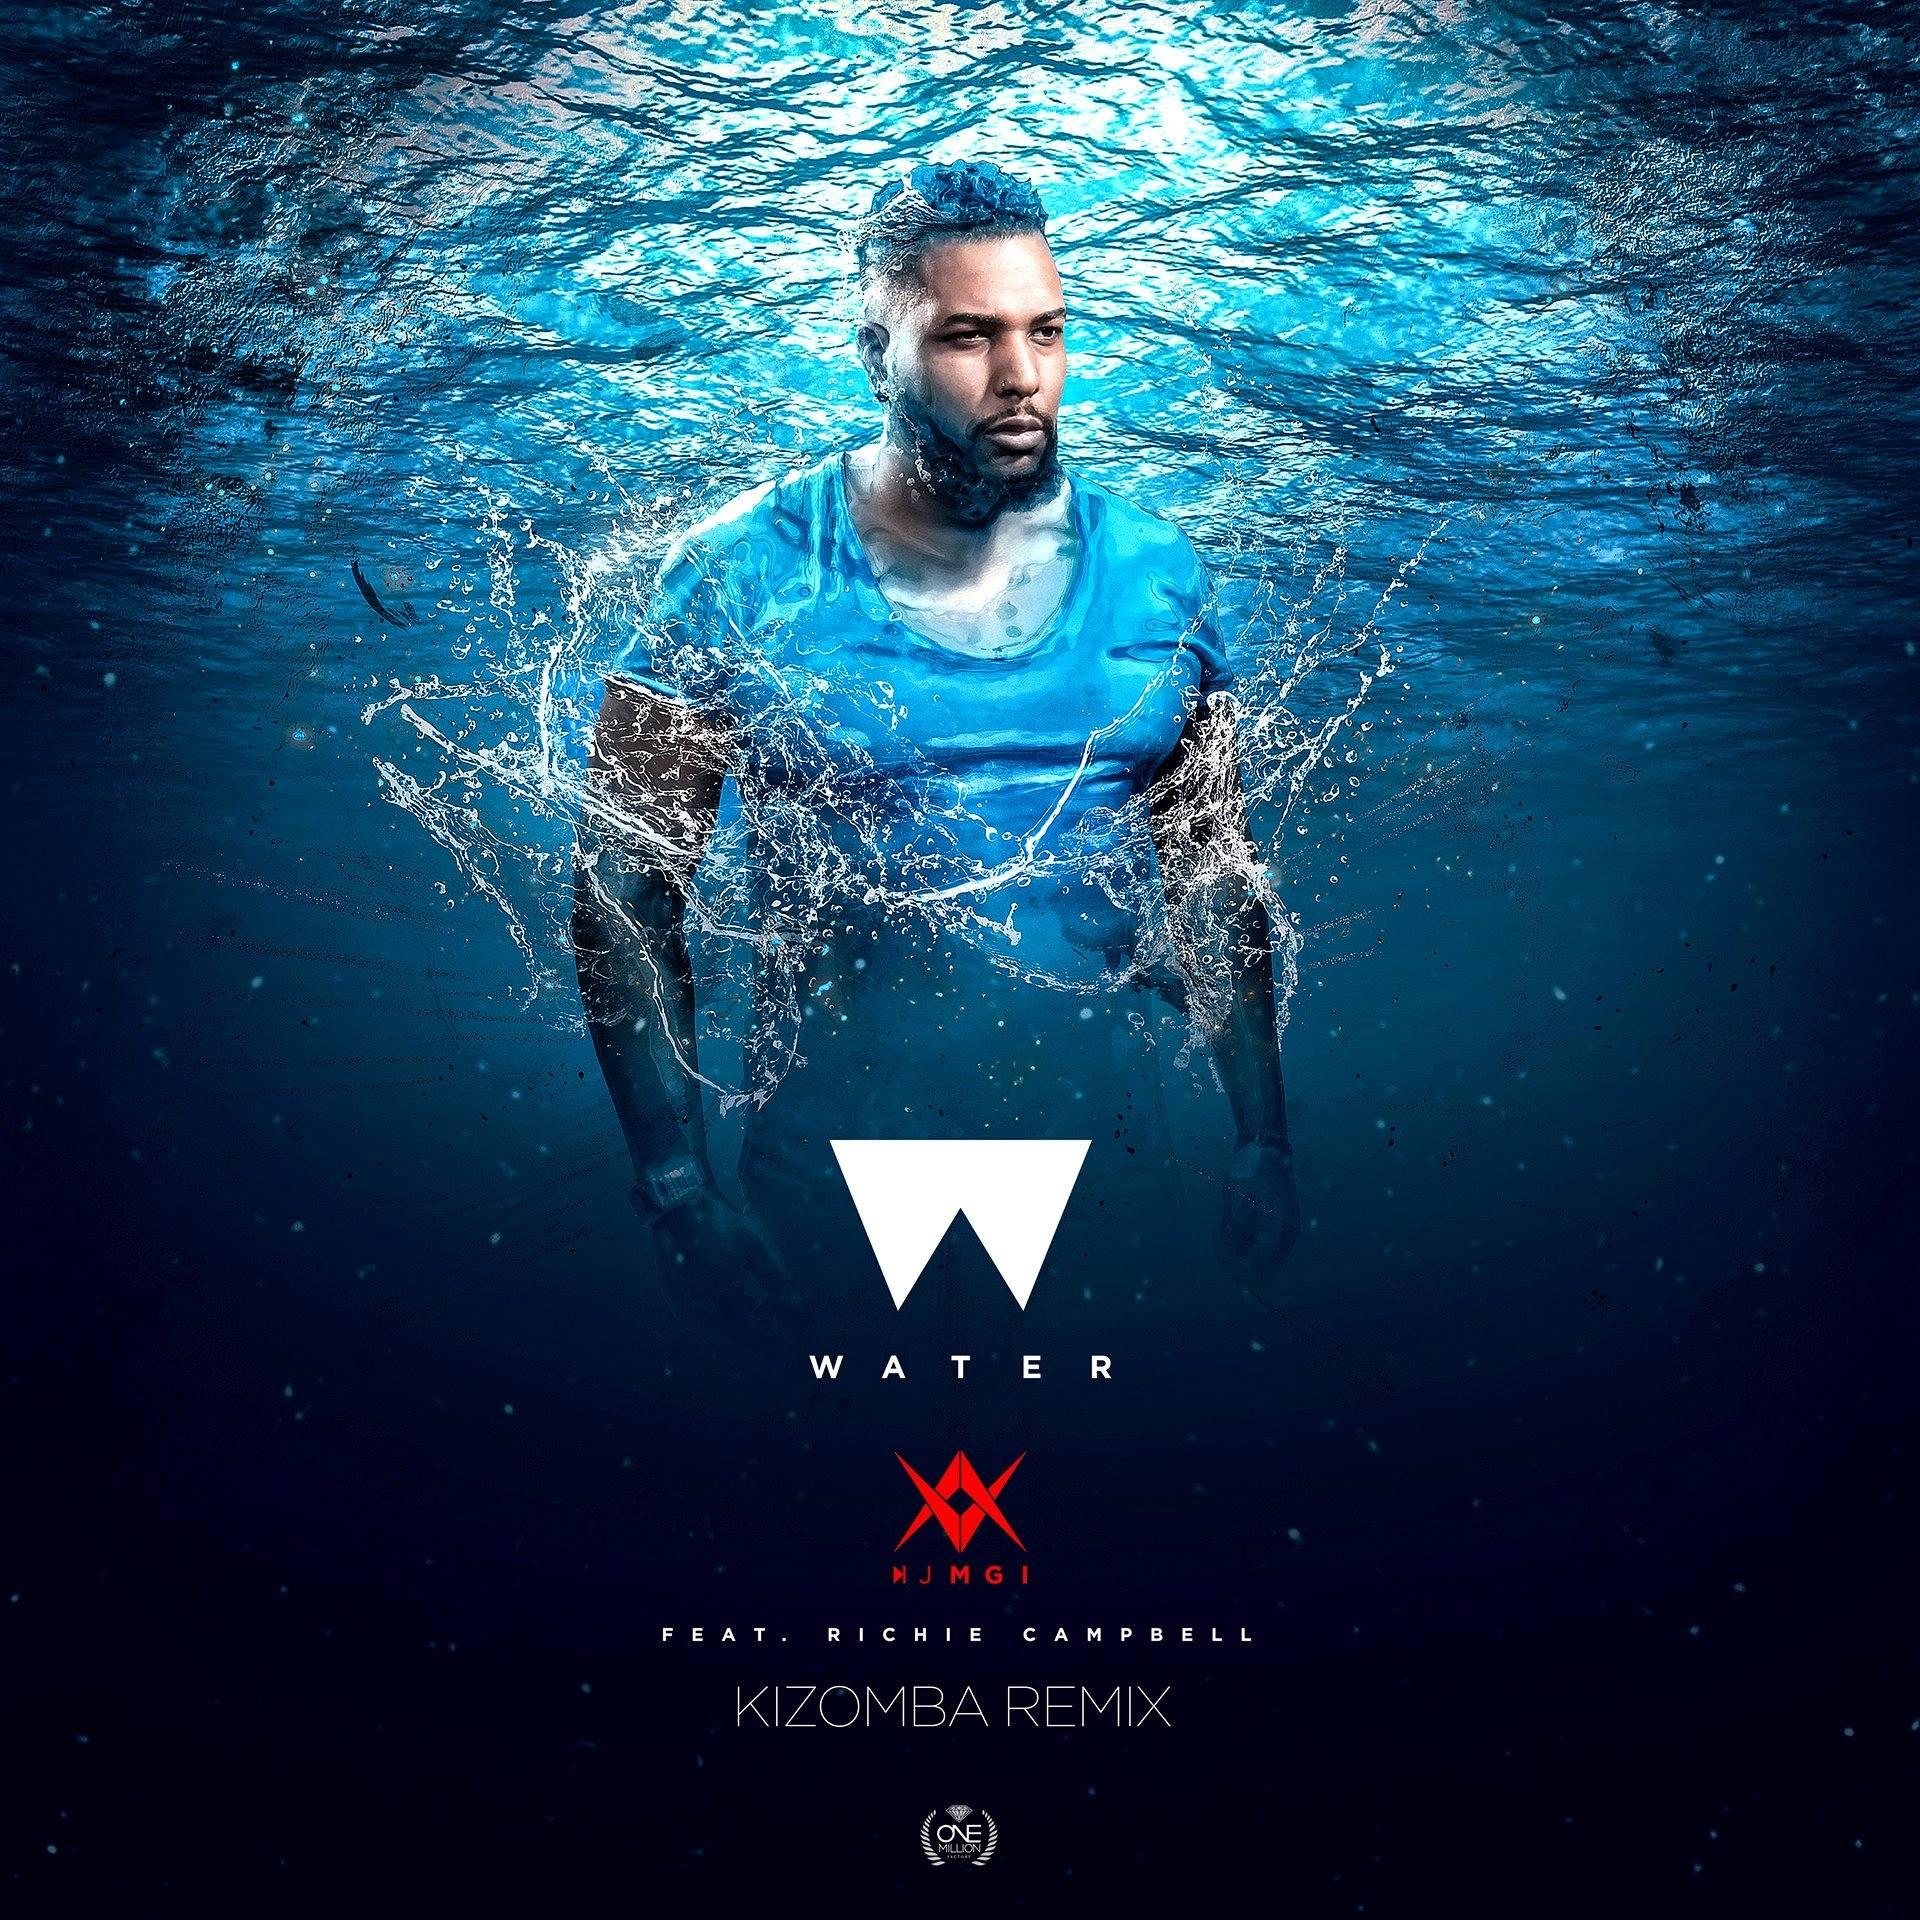 water - Dj Mgi - Kizomba remix - 2018